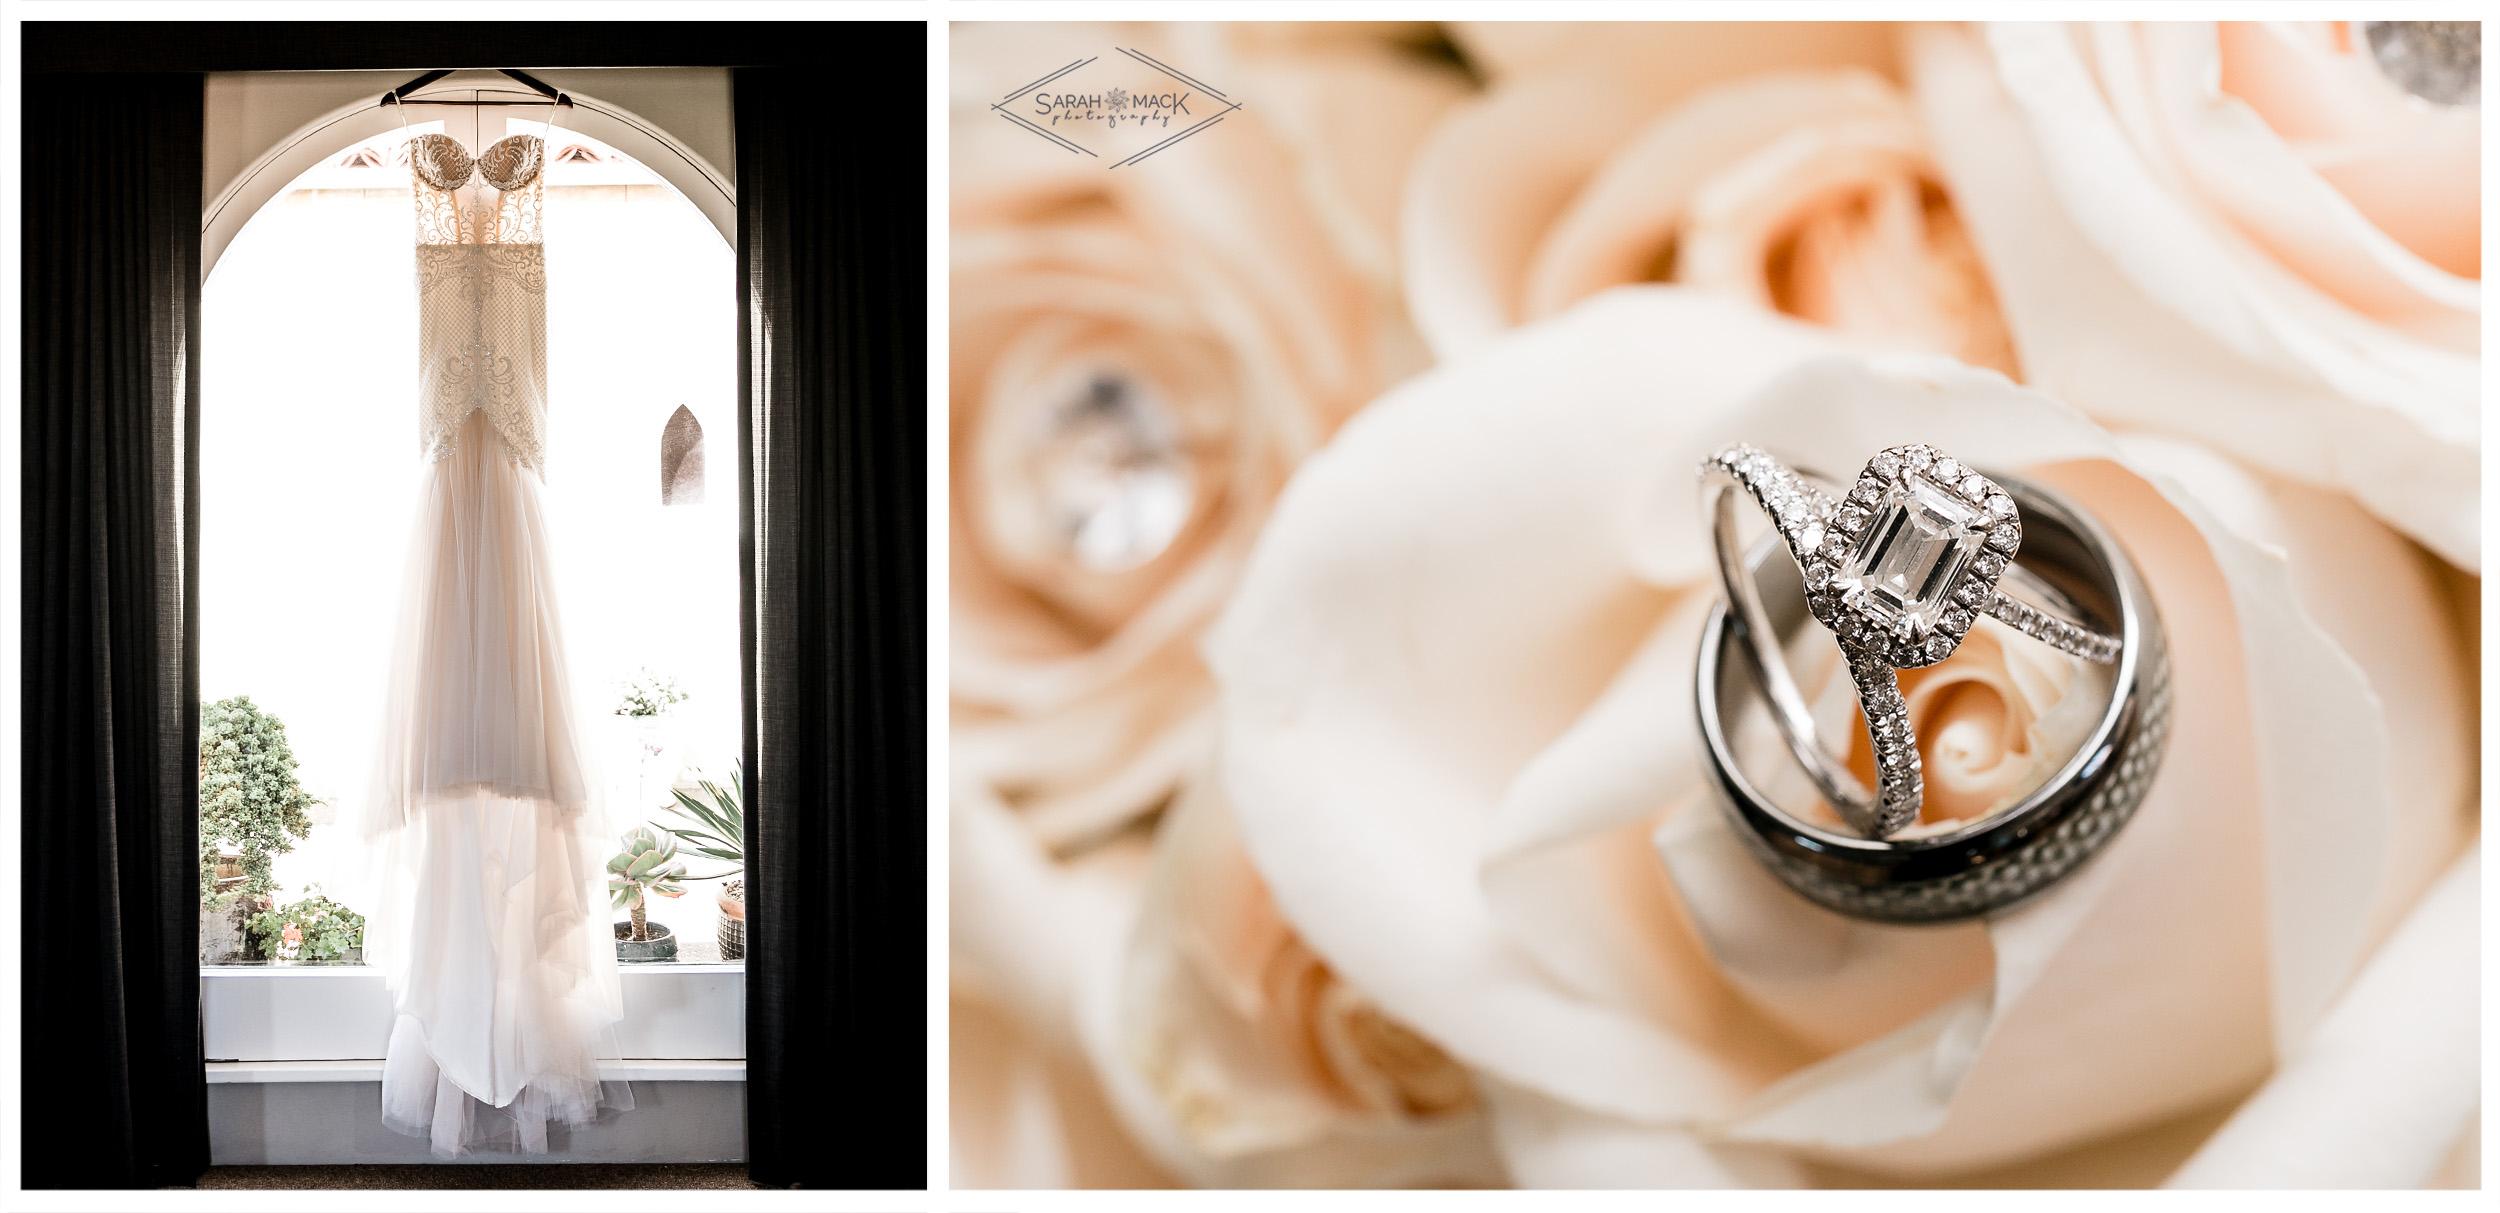 MK-Santa-Monica-Catholic-Church-Wedding-Photography-2.jpg